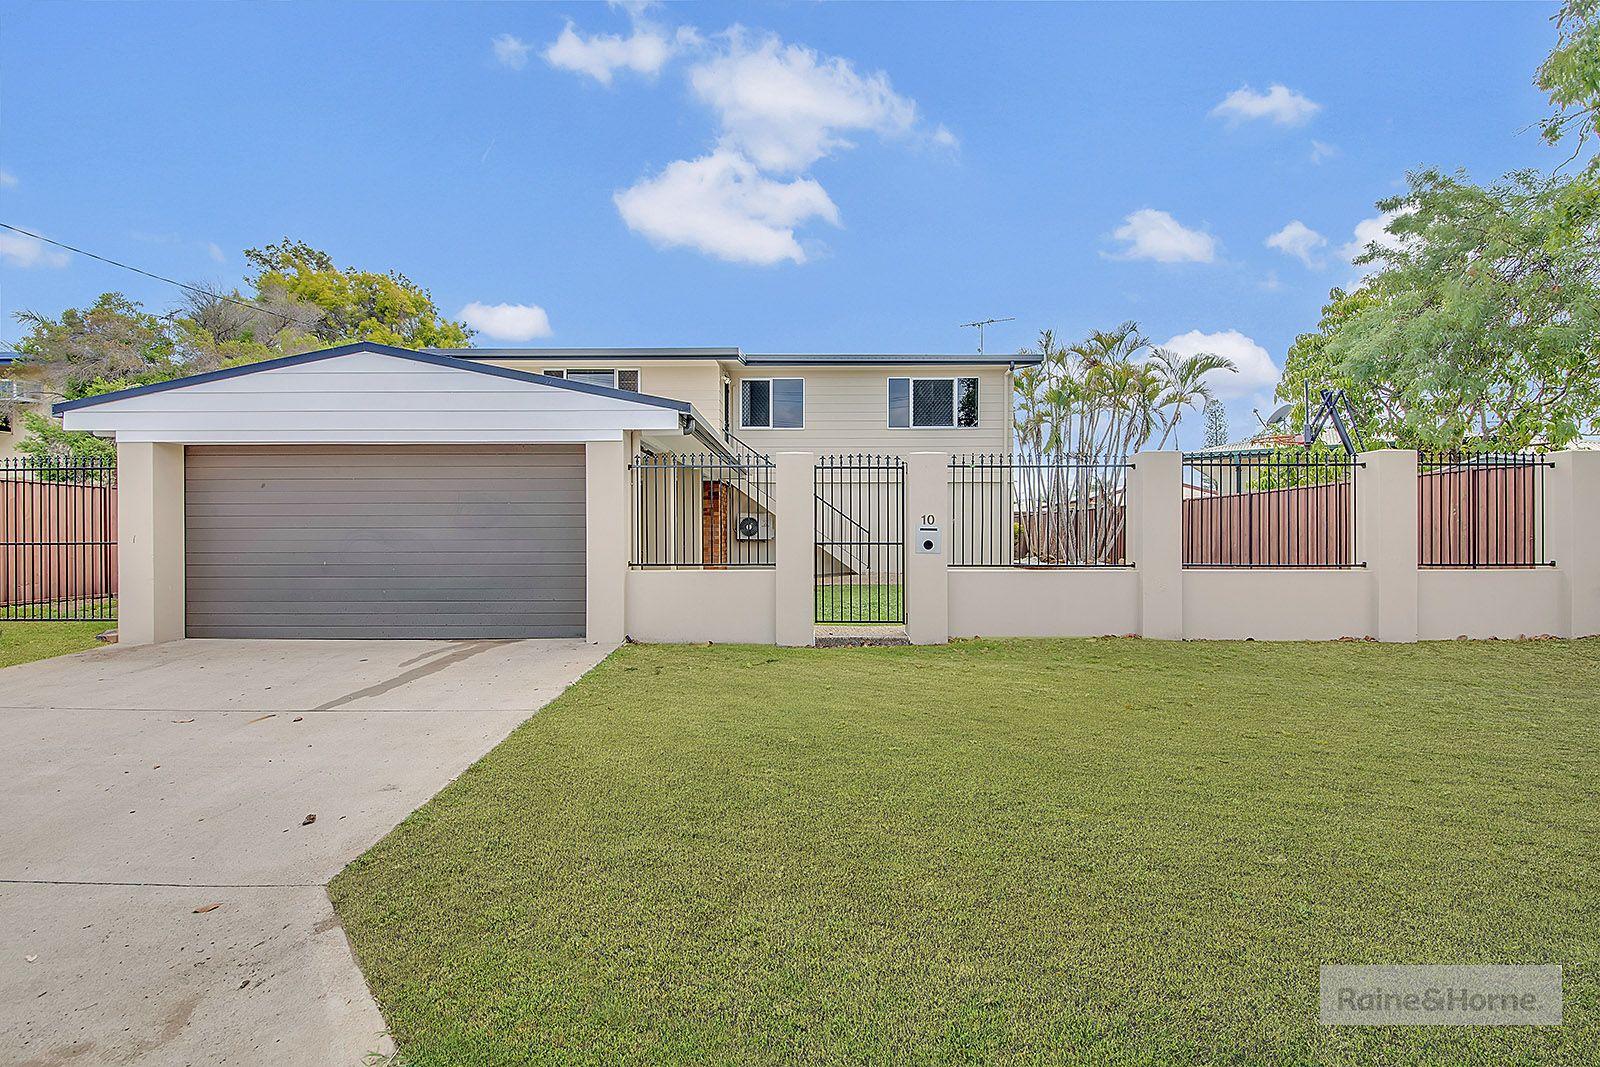 10 Duffy Street, Kawana QLD 4701, Image 0